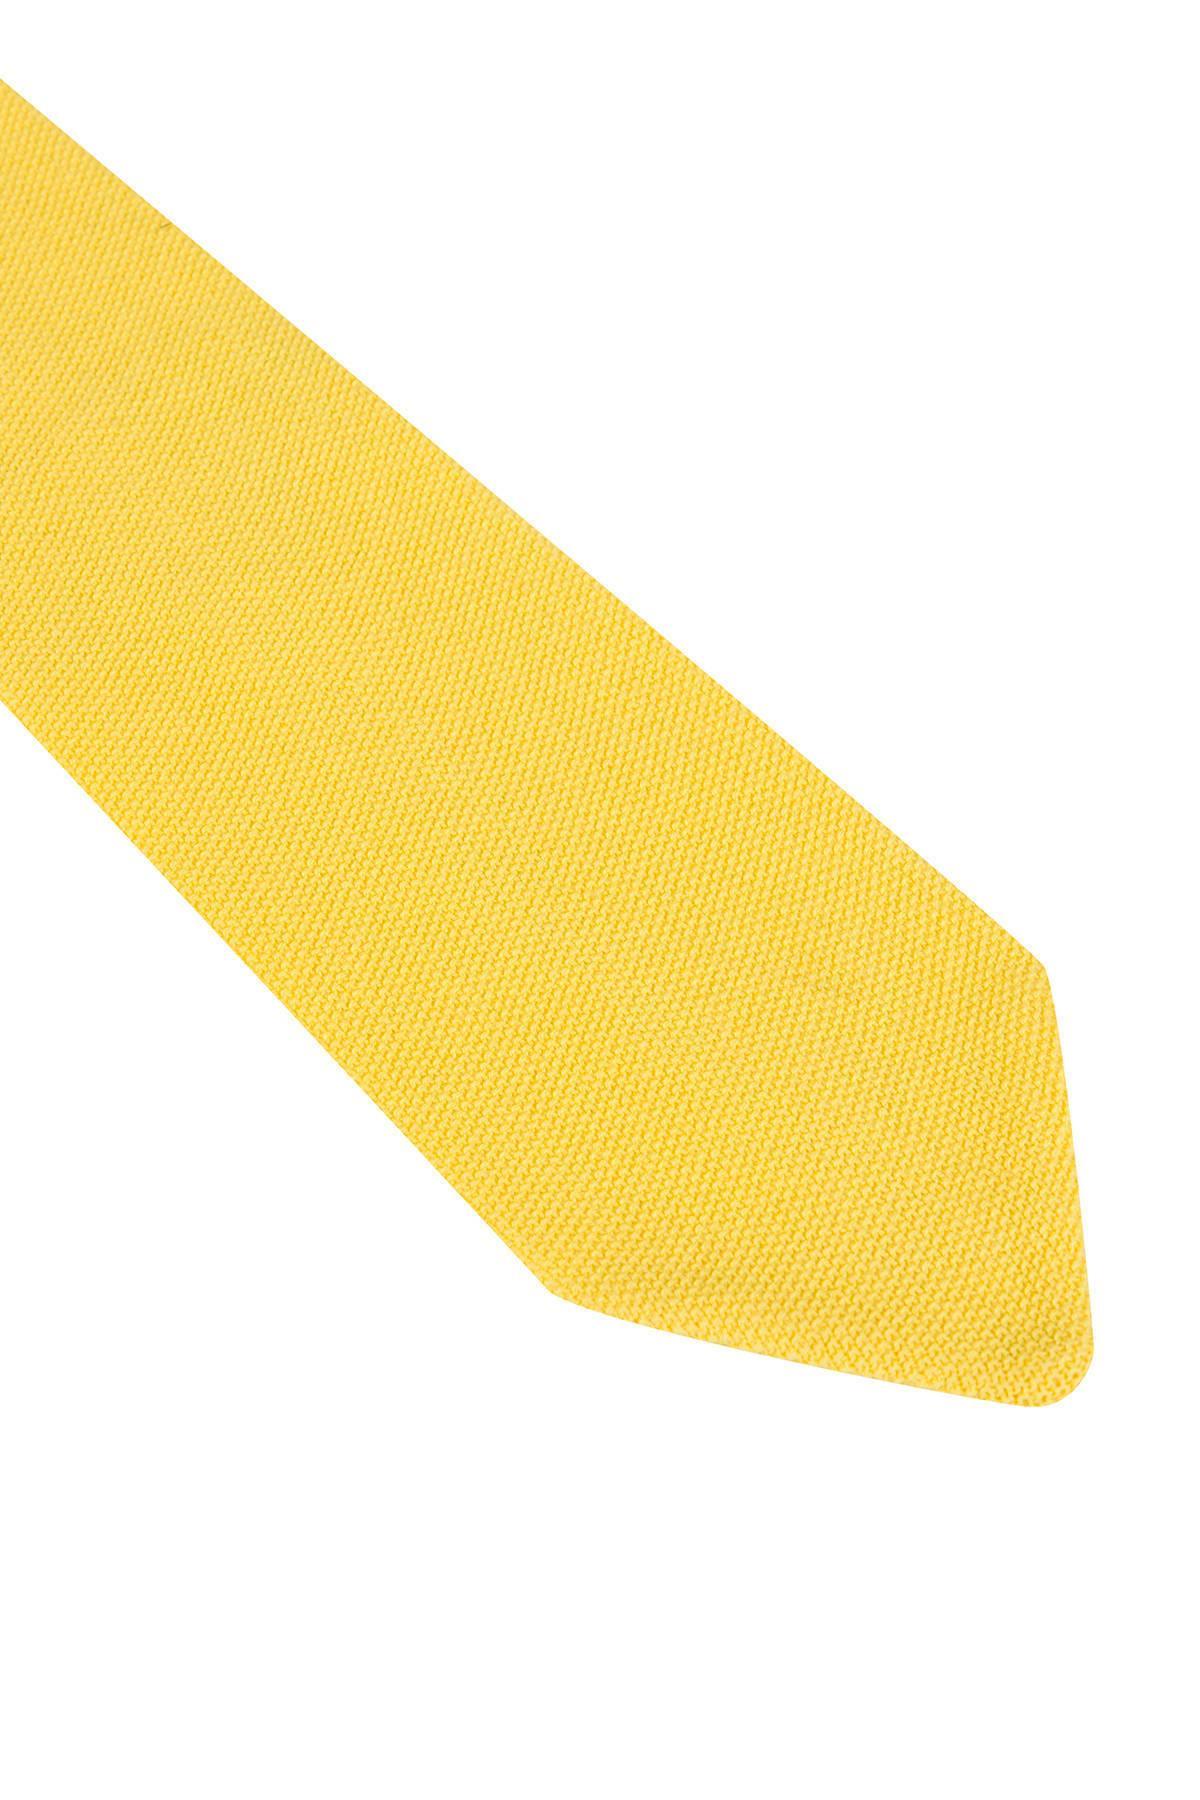 Pike Örgü Sarı Triko Kravat